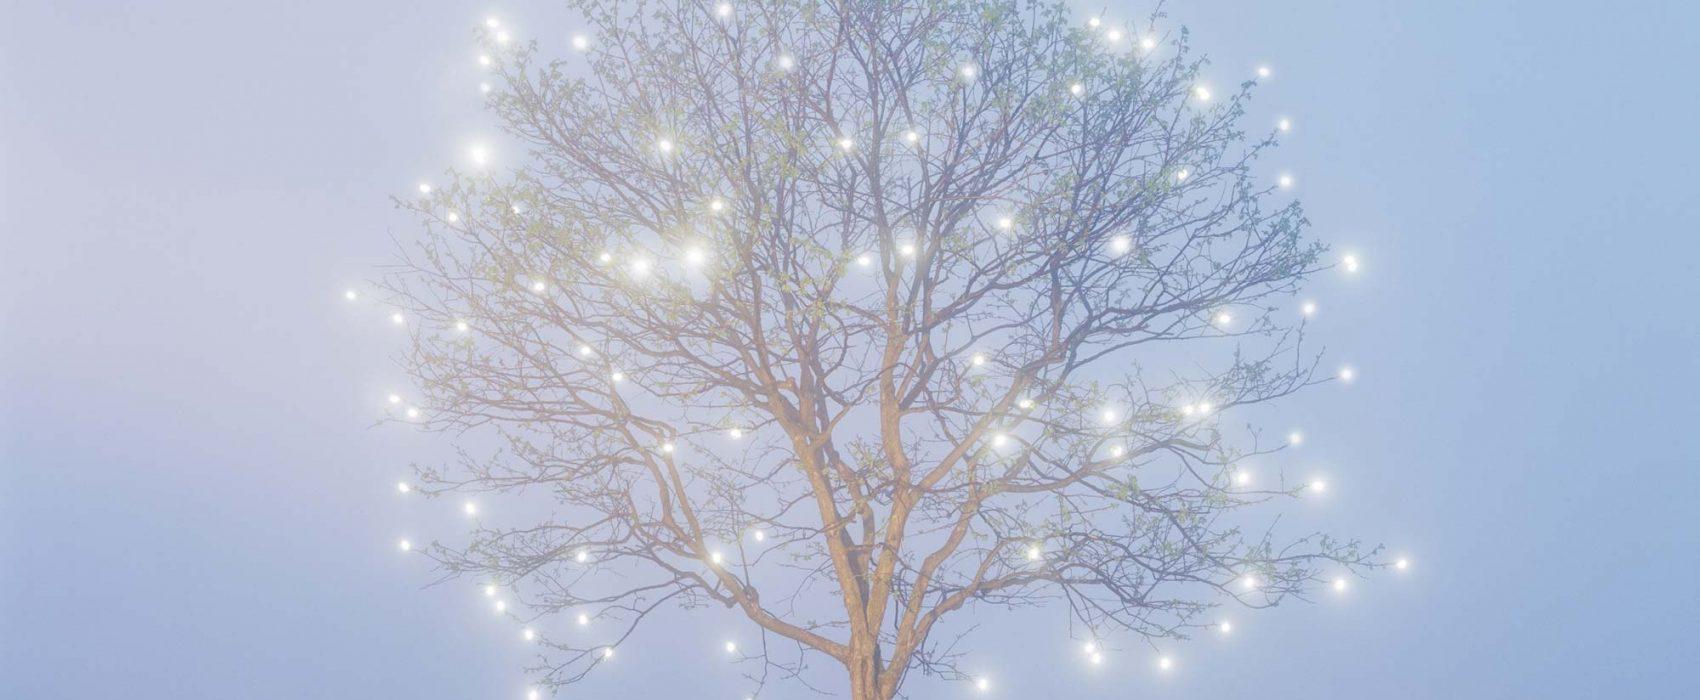 leejeonglok_tree-of-life